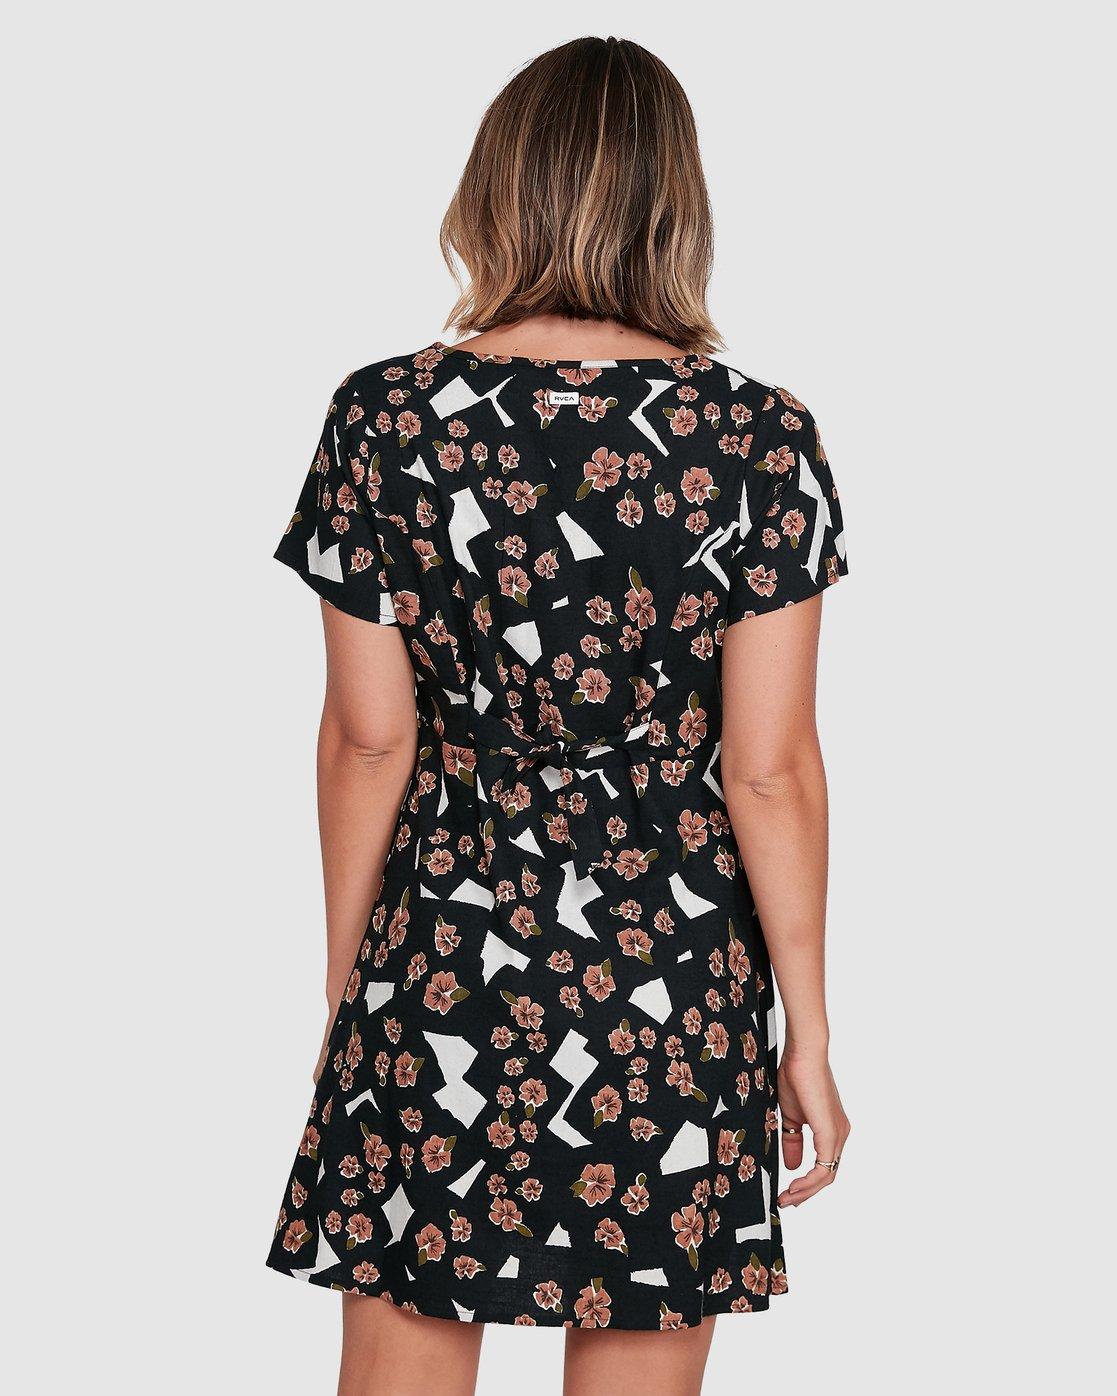 Floral Pop Dress 9352315400893   RVCA